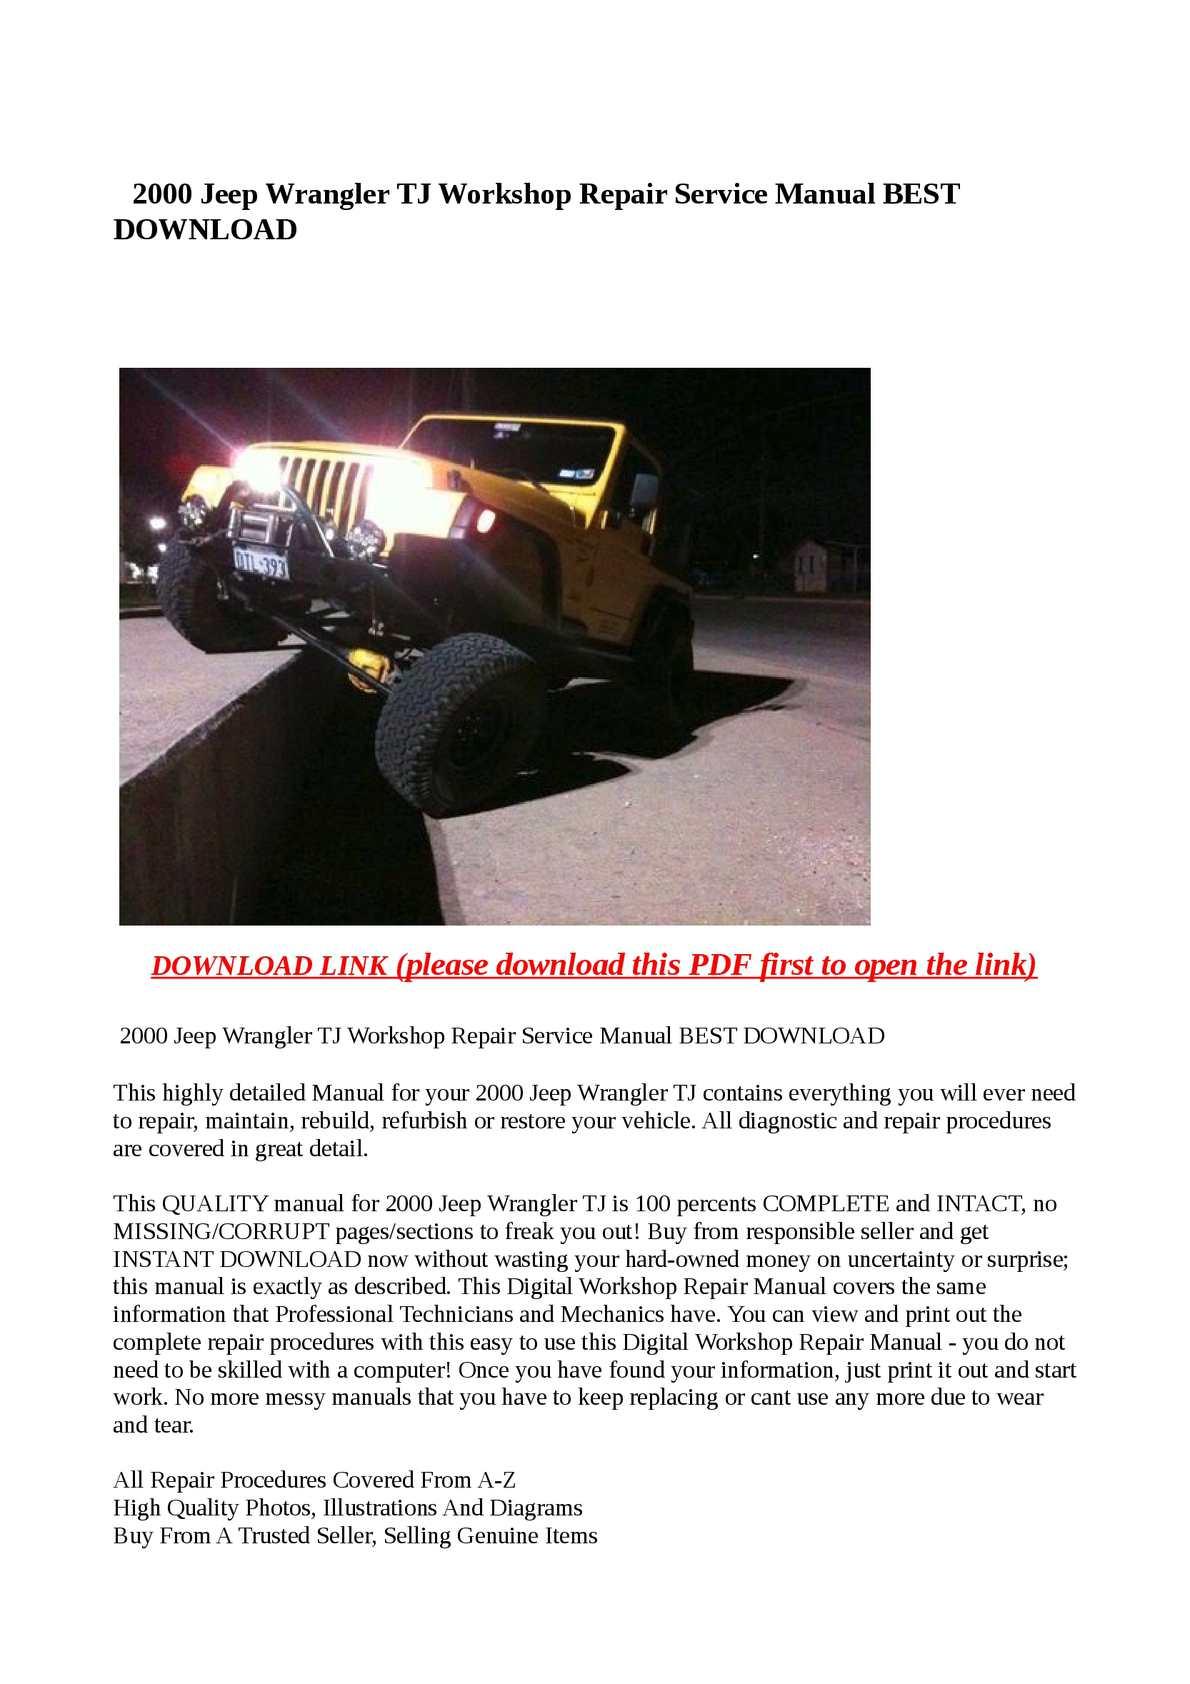 jeep wrangler service pdf